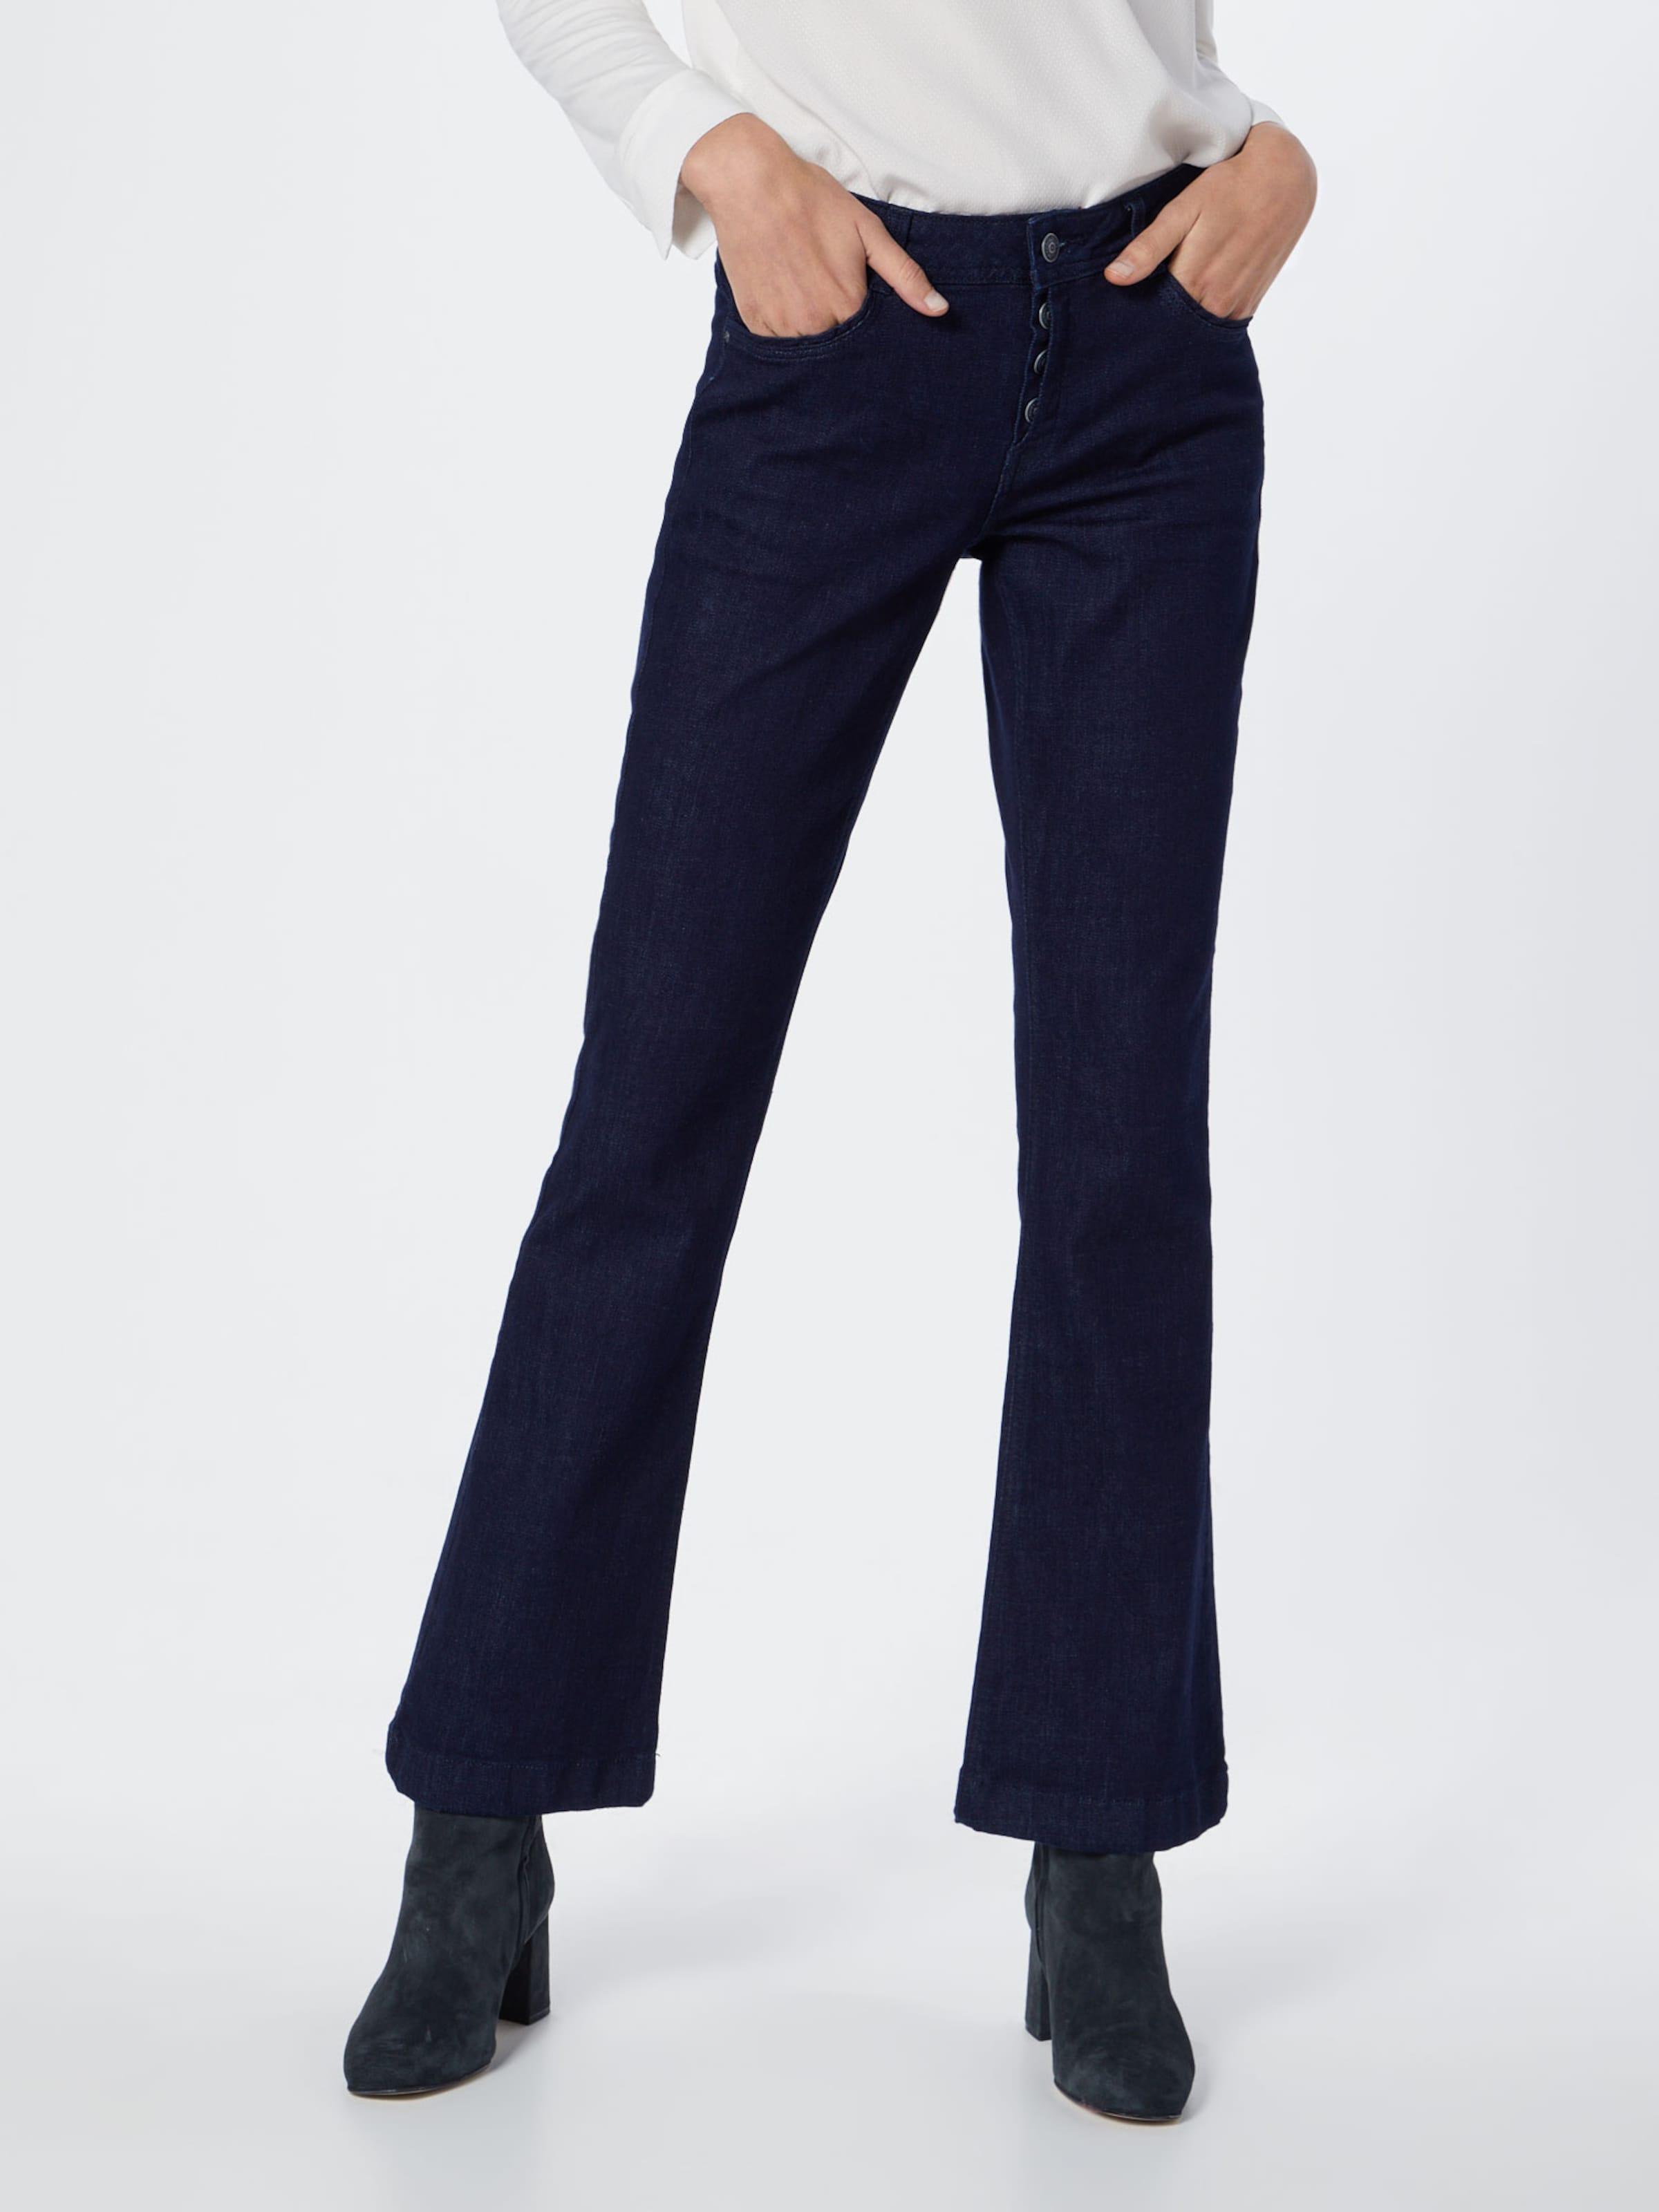 oliver DenimDunkelblau Jeans In S Blue 'shape Bootcut' XTOPZiku